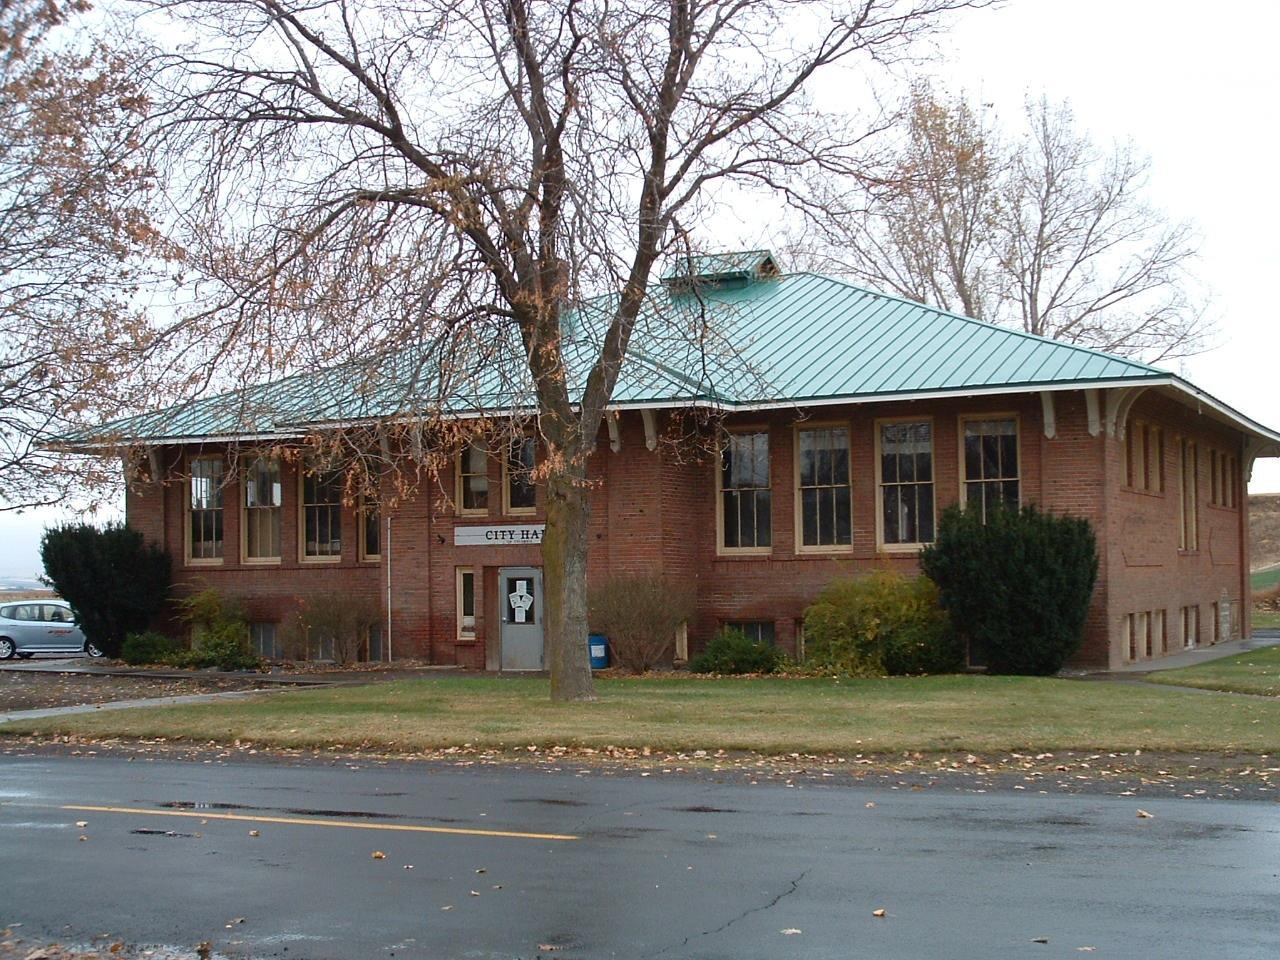 Helix Public Library building